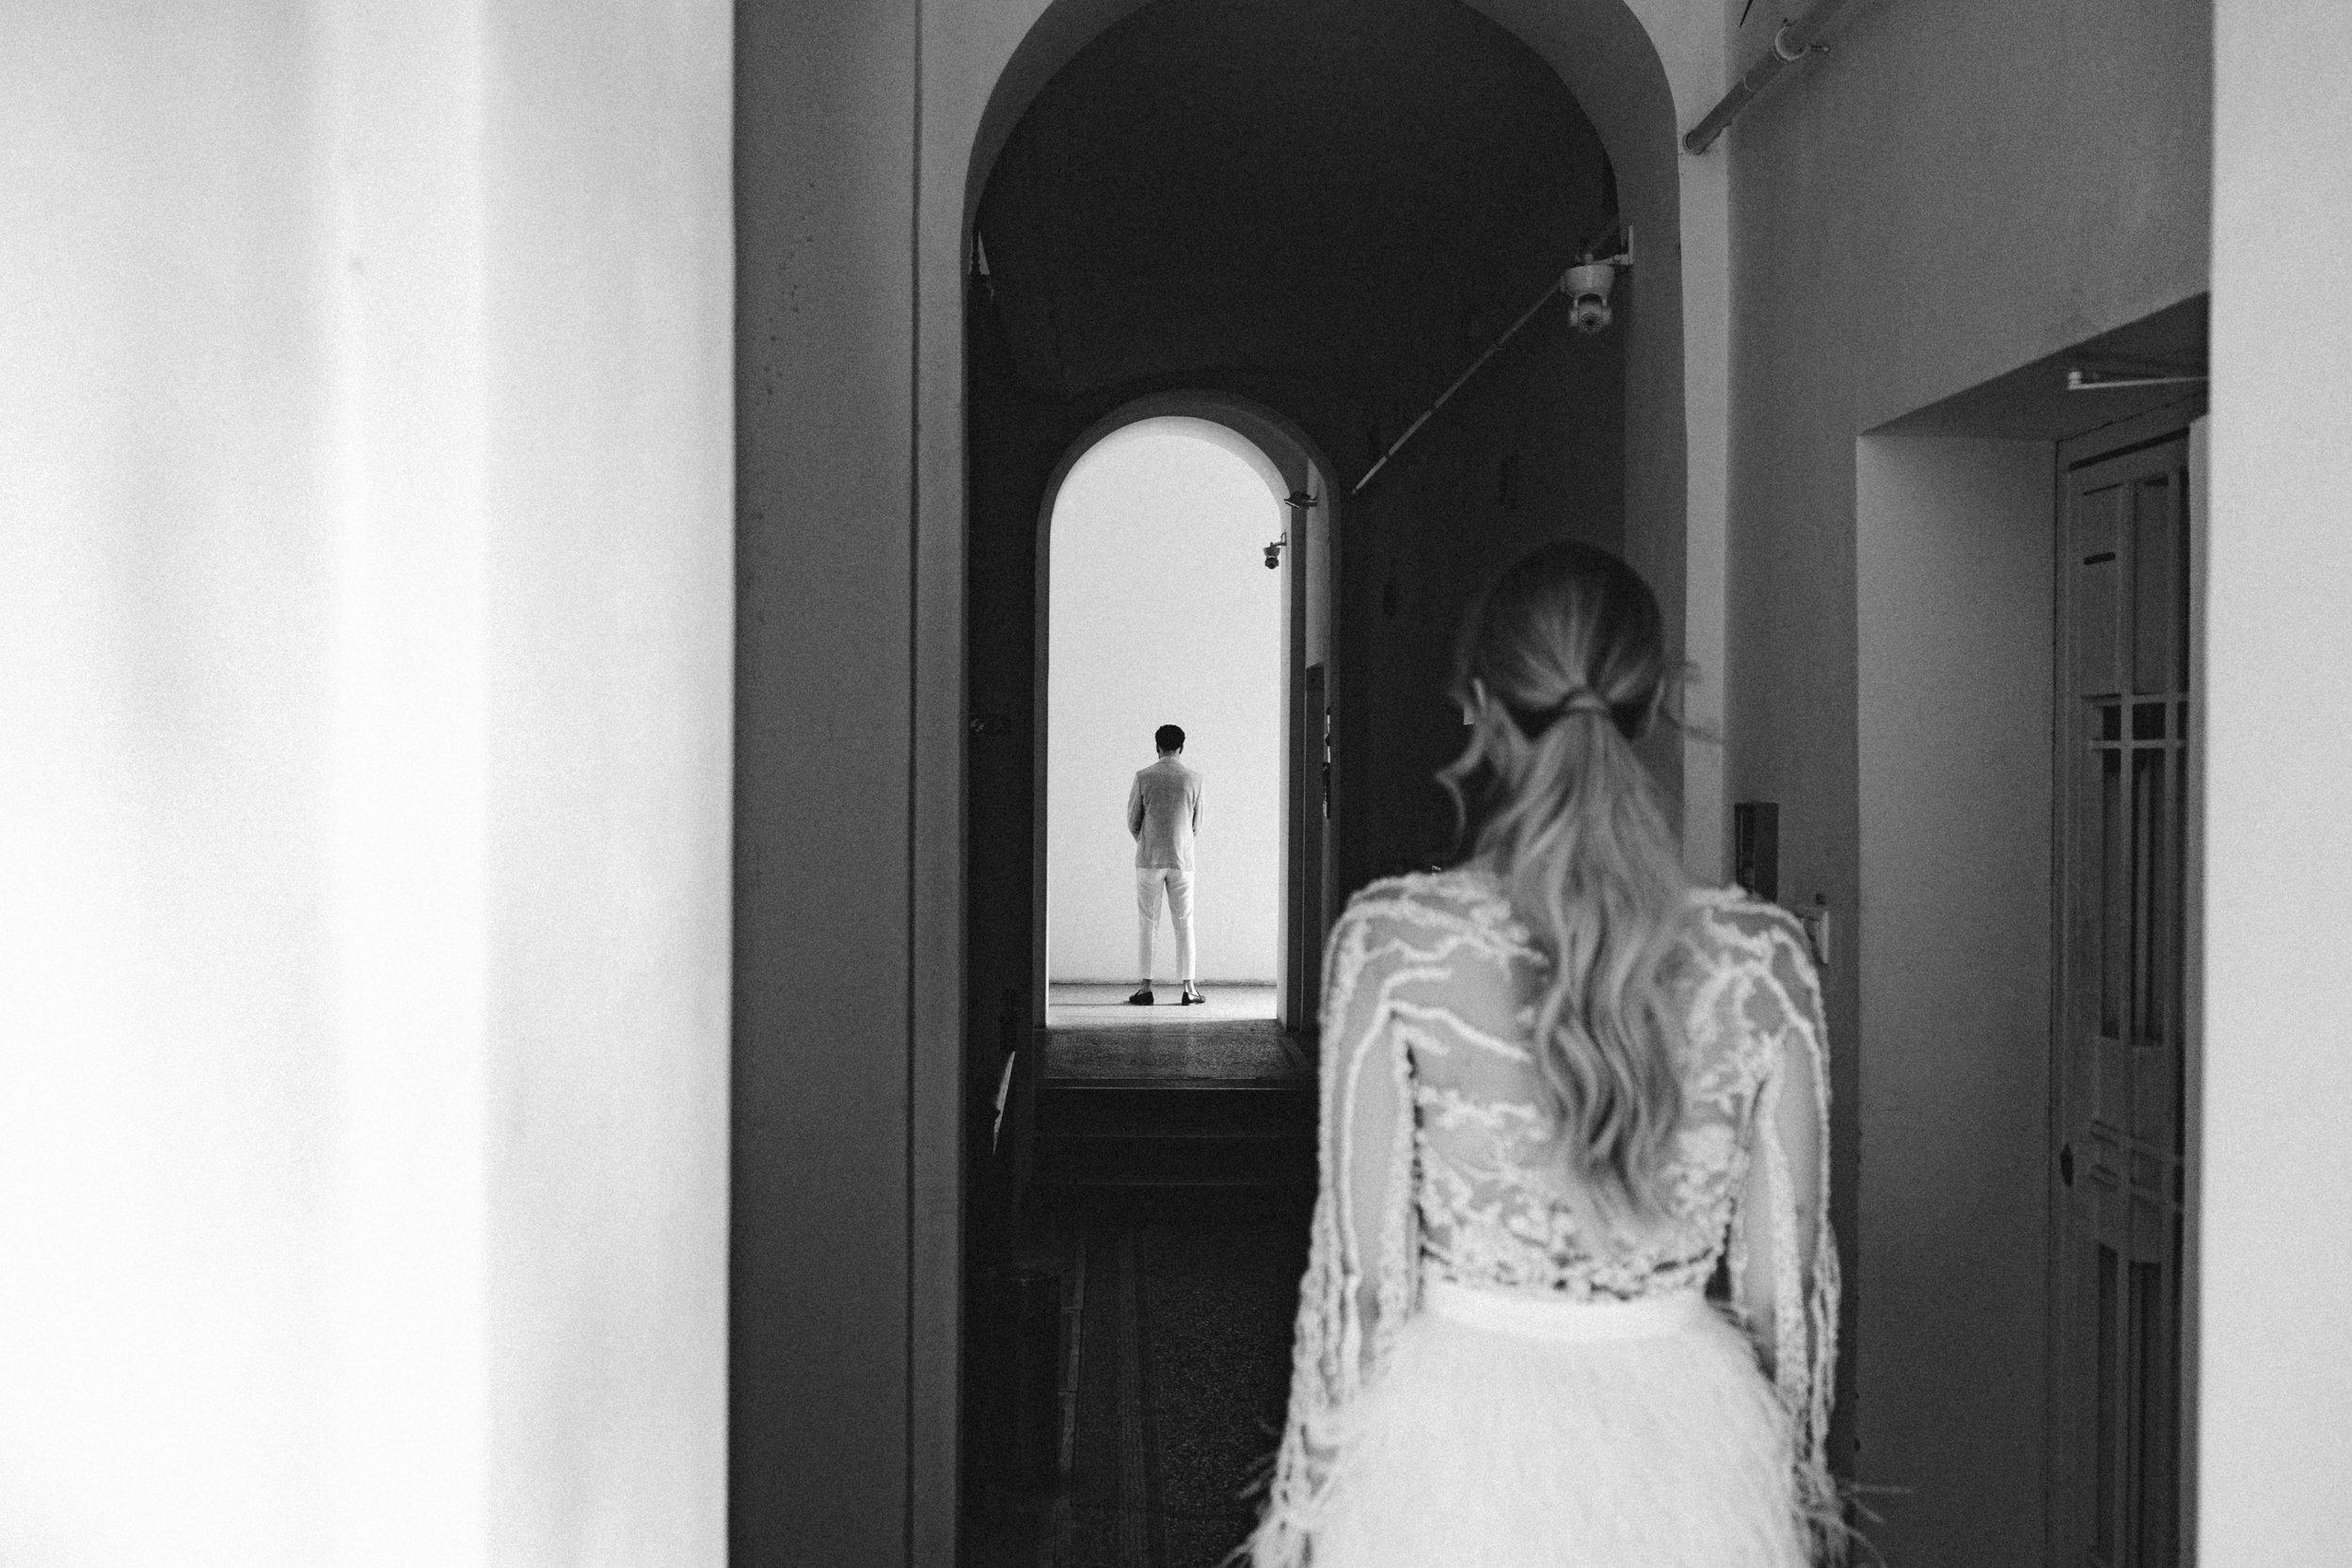 1819-Evelin+Peti-wedding-017-w.jpg